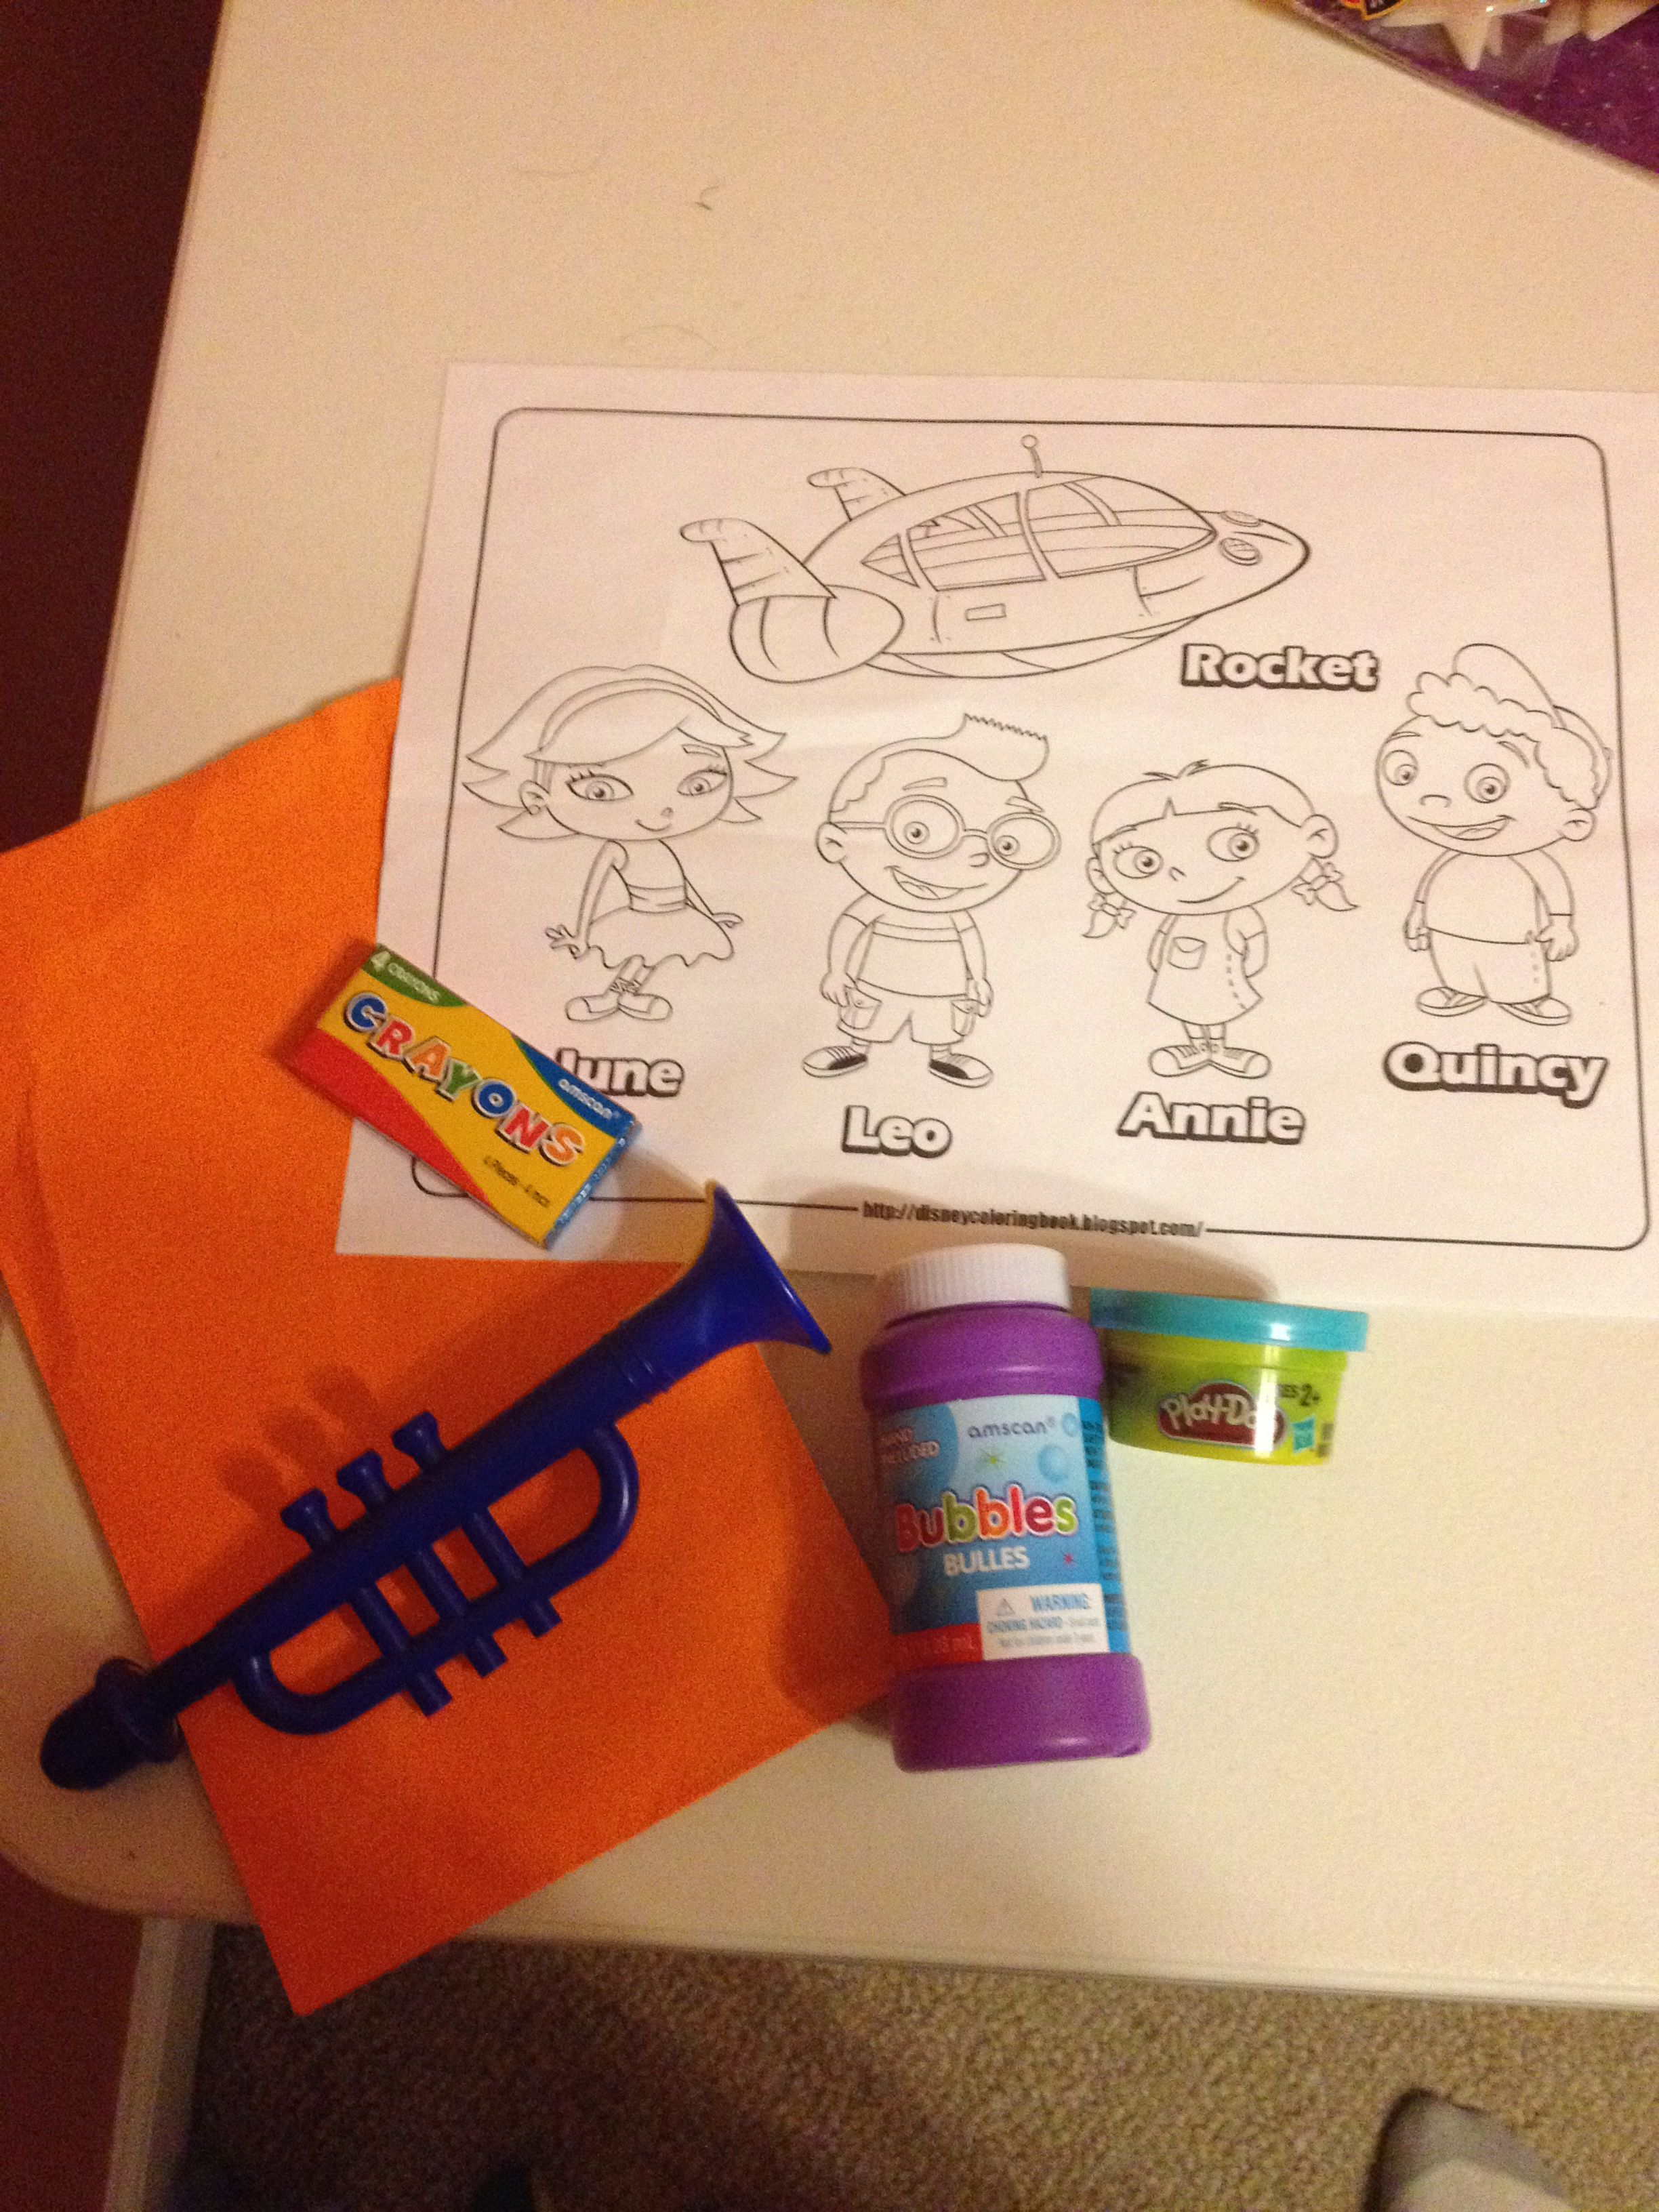 Little Einsteins Treat Bag Bubbles Crayons Coloring Sheet Play Doh Trumpet Little Einsteins Coloring Pages Einstein [ jpg ]